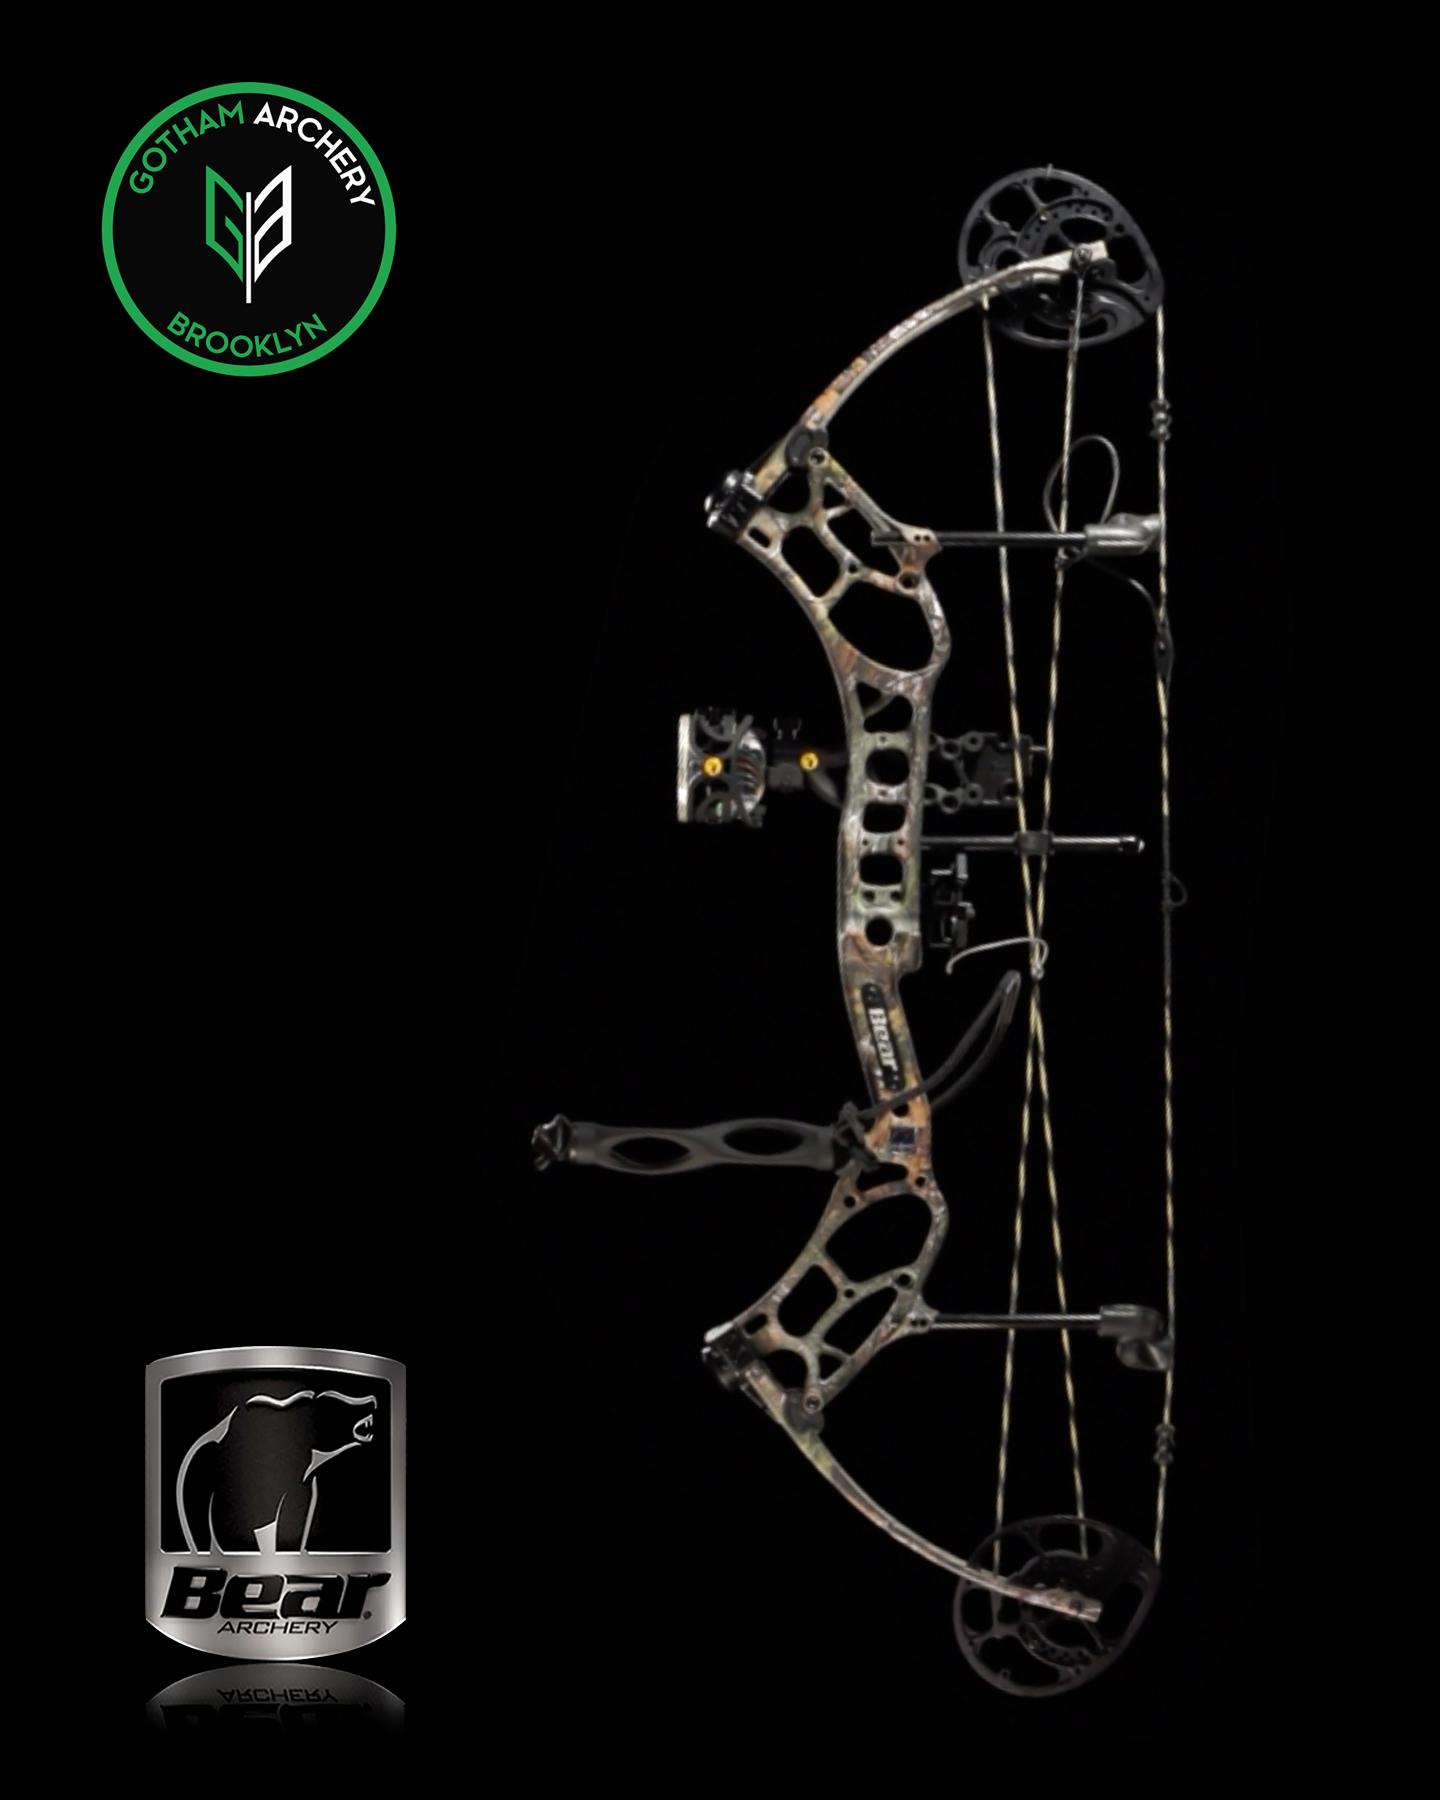 Gotham Archery Bear Legend Series LS2